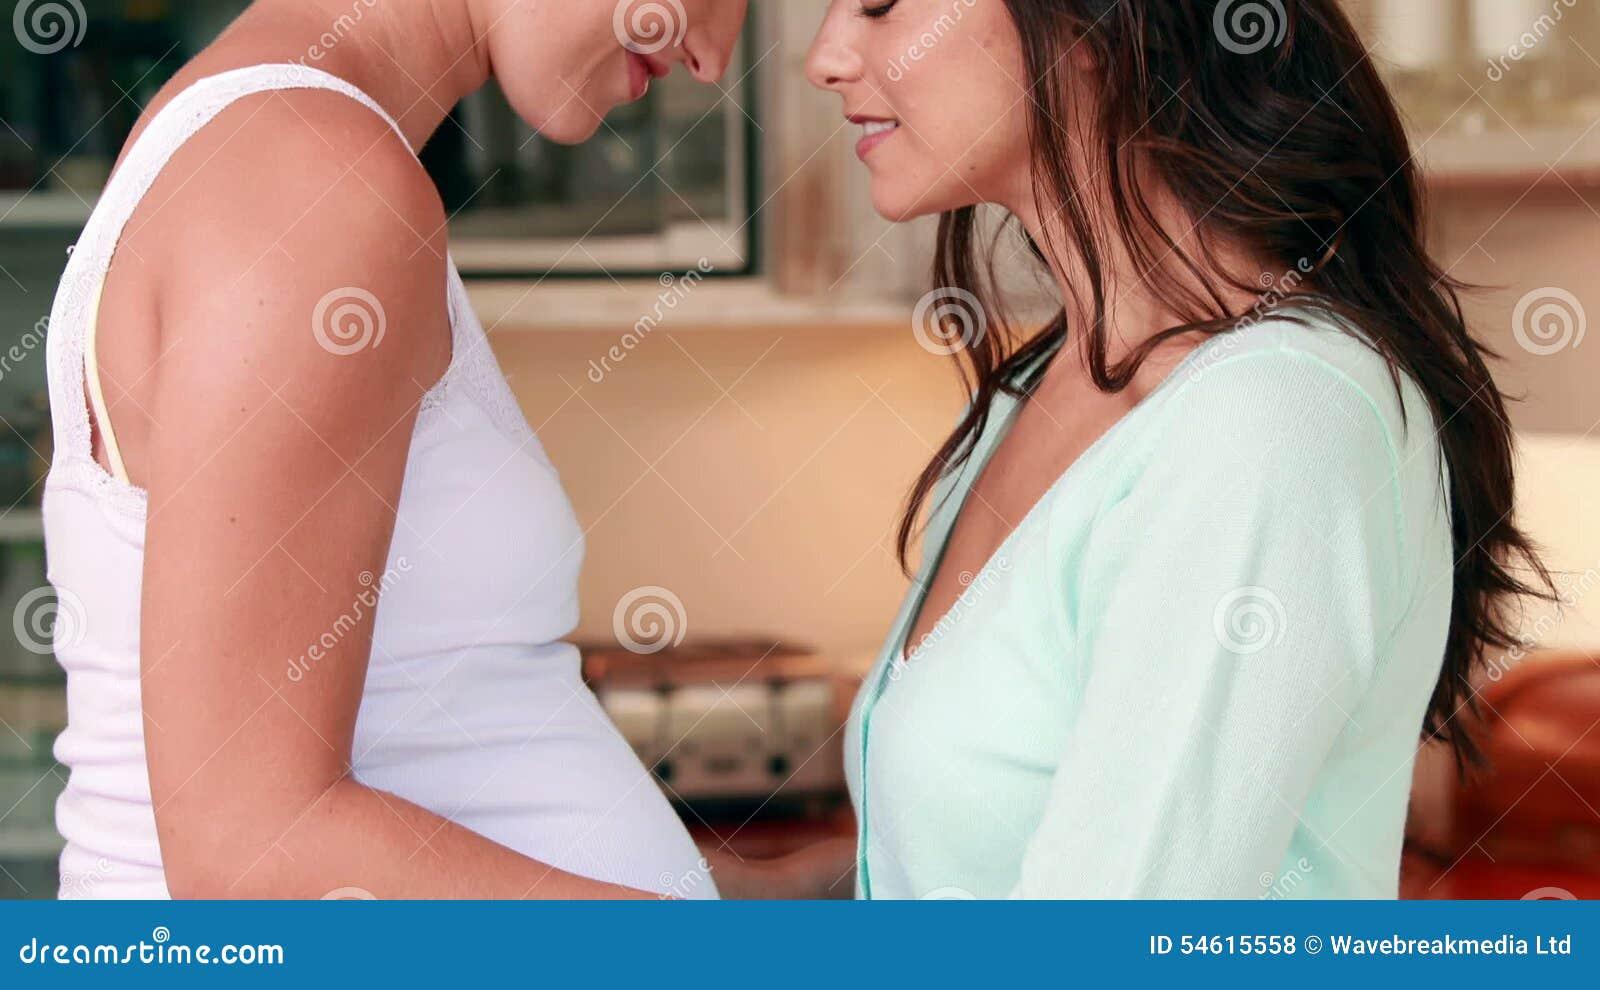 quality lesbian photos high